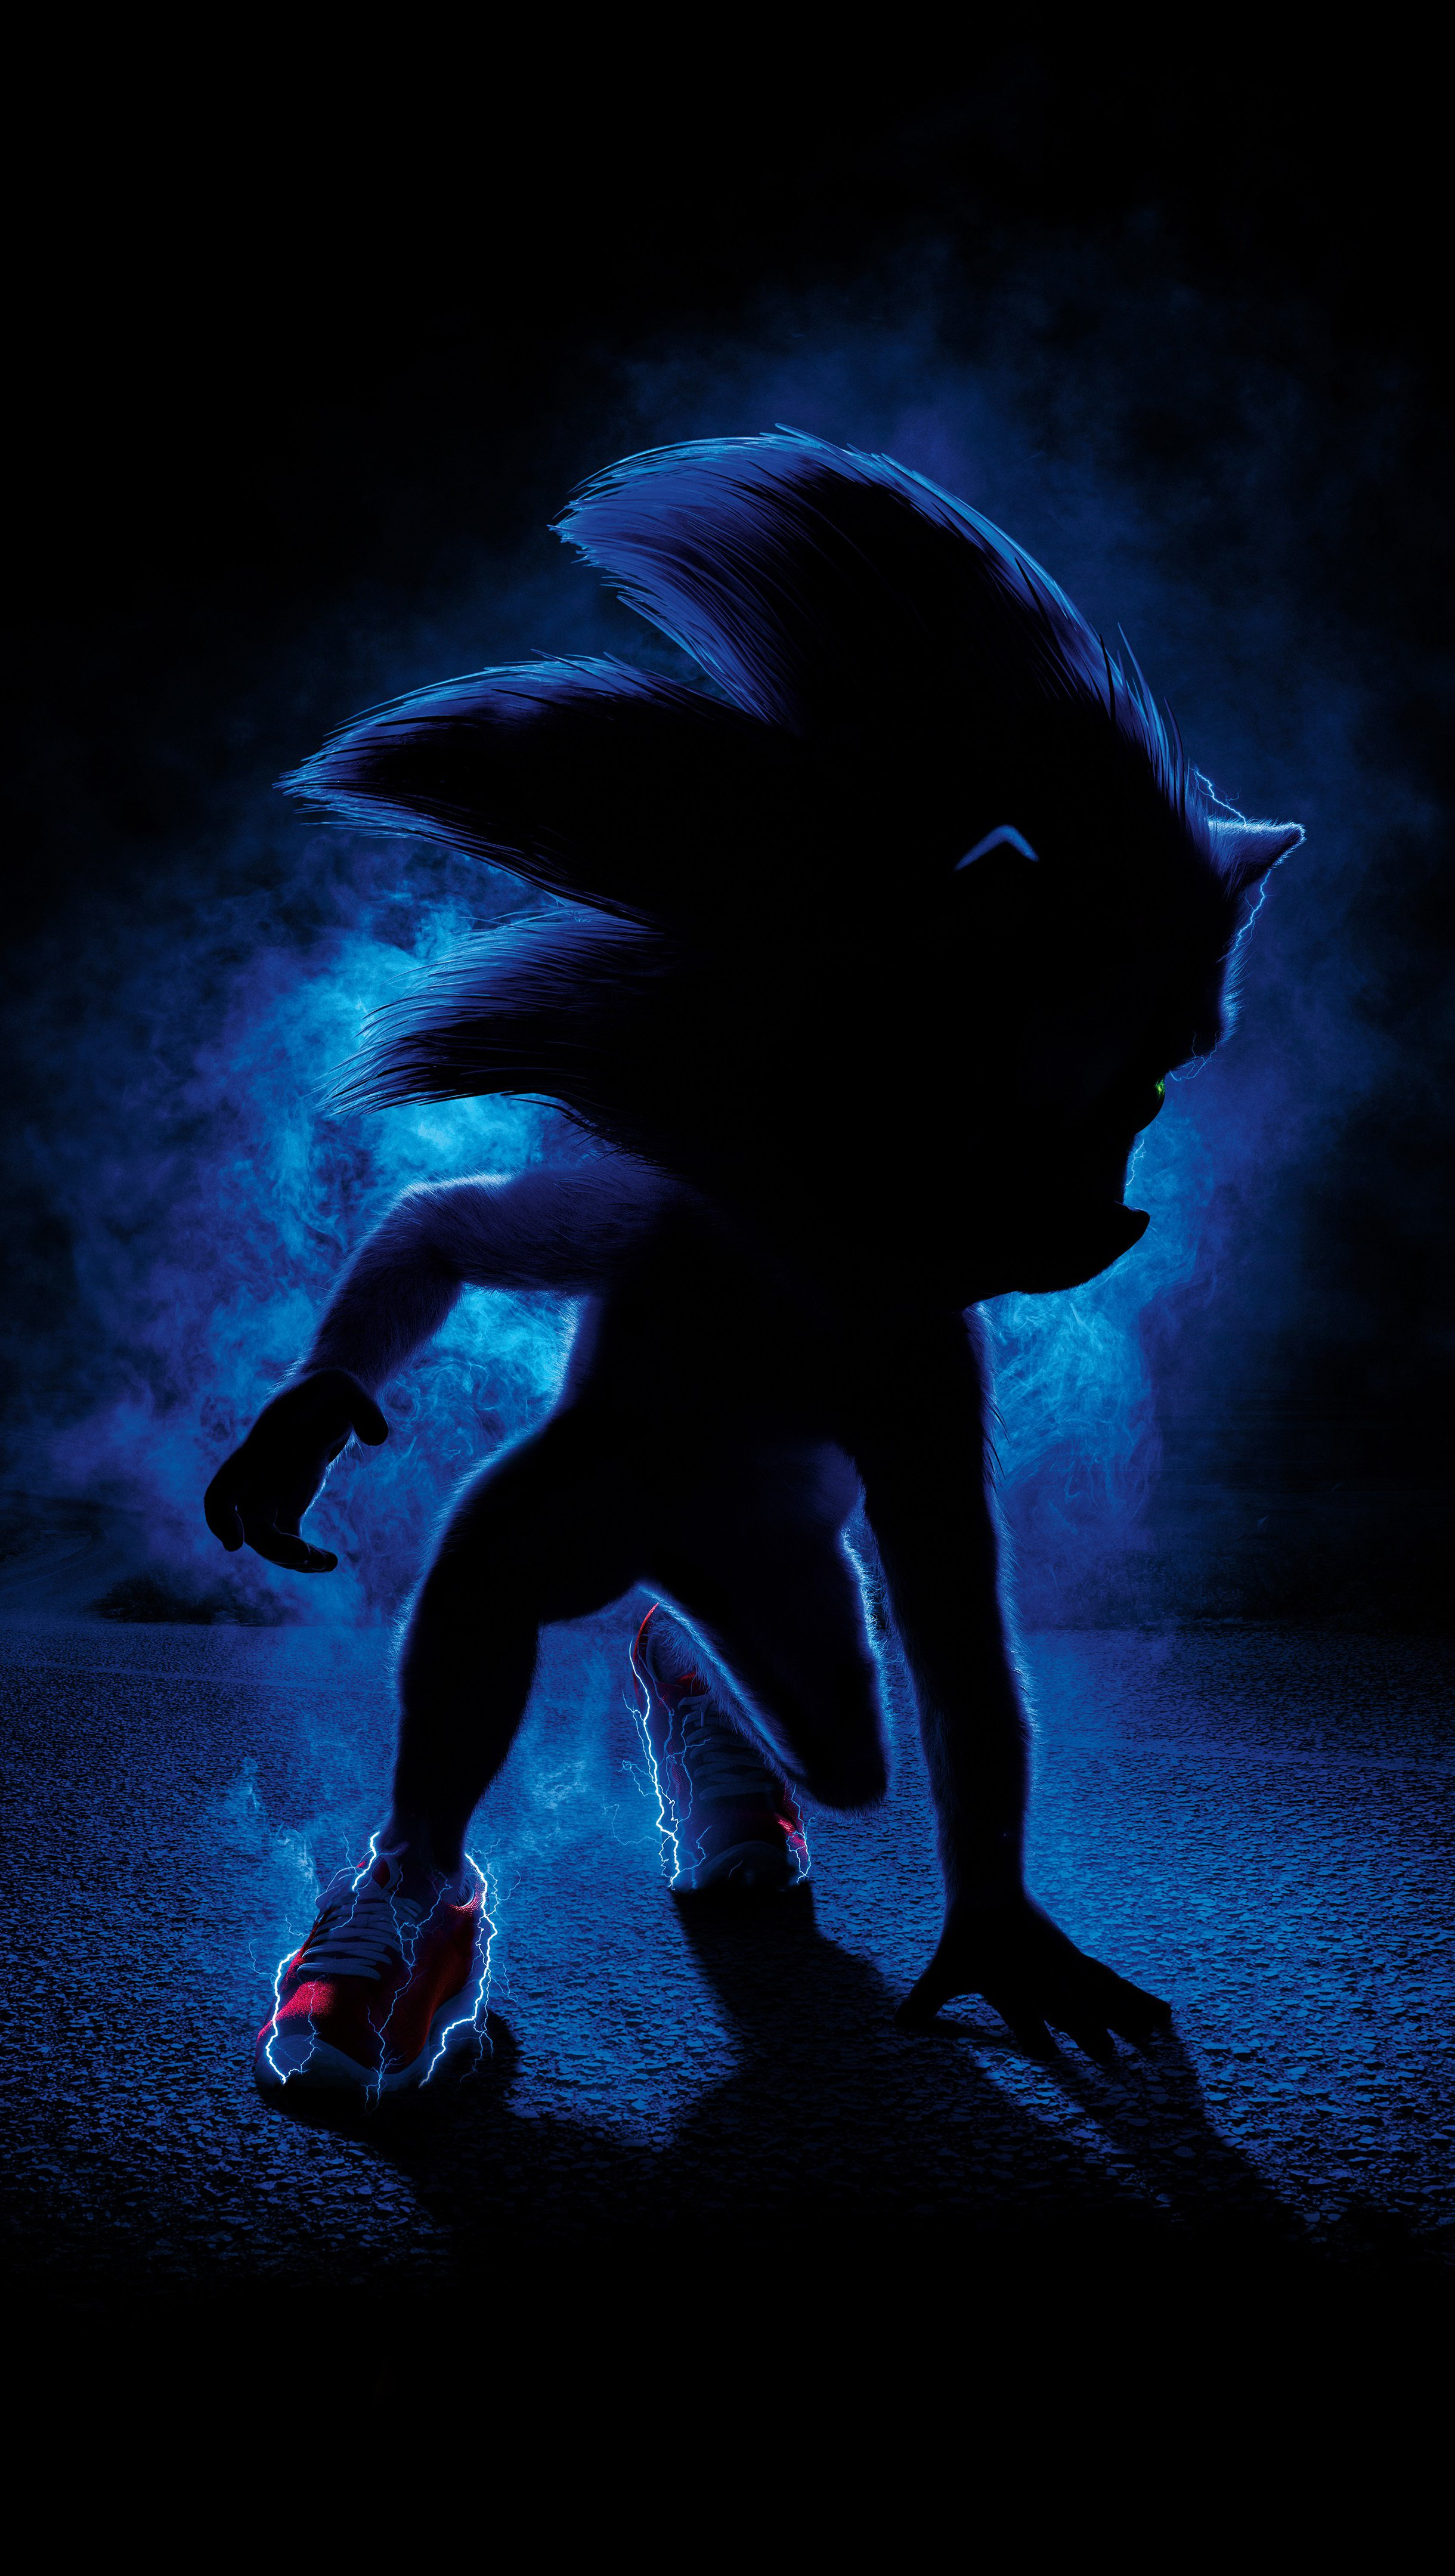 Wallpaper Sonic the Hedgehog Movie Vertical